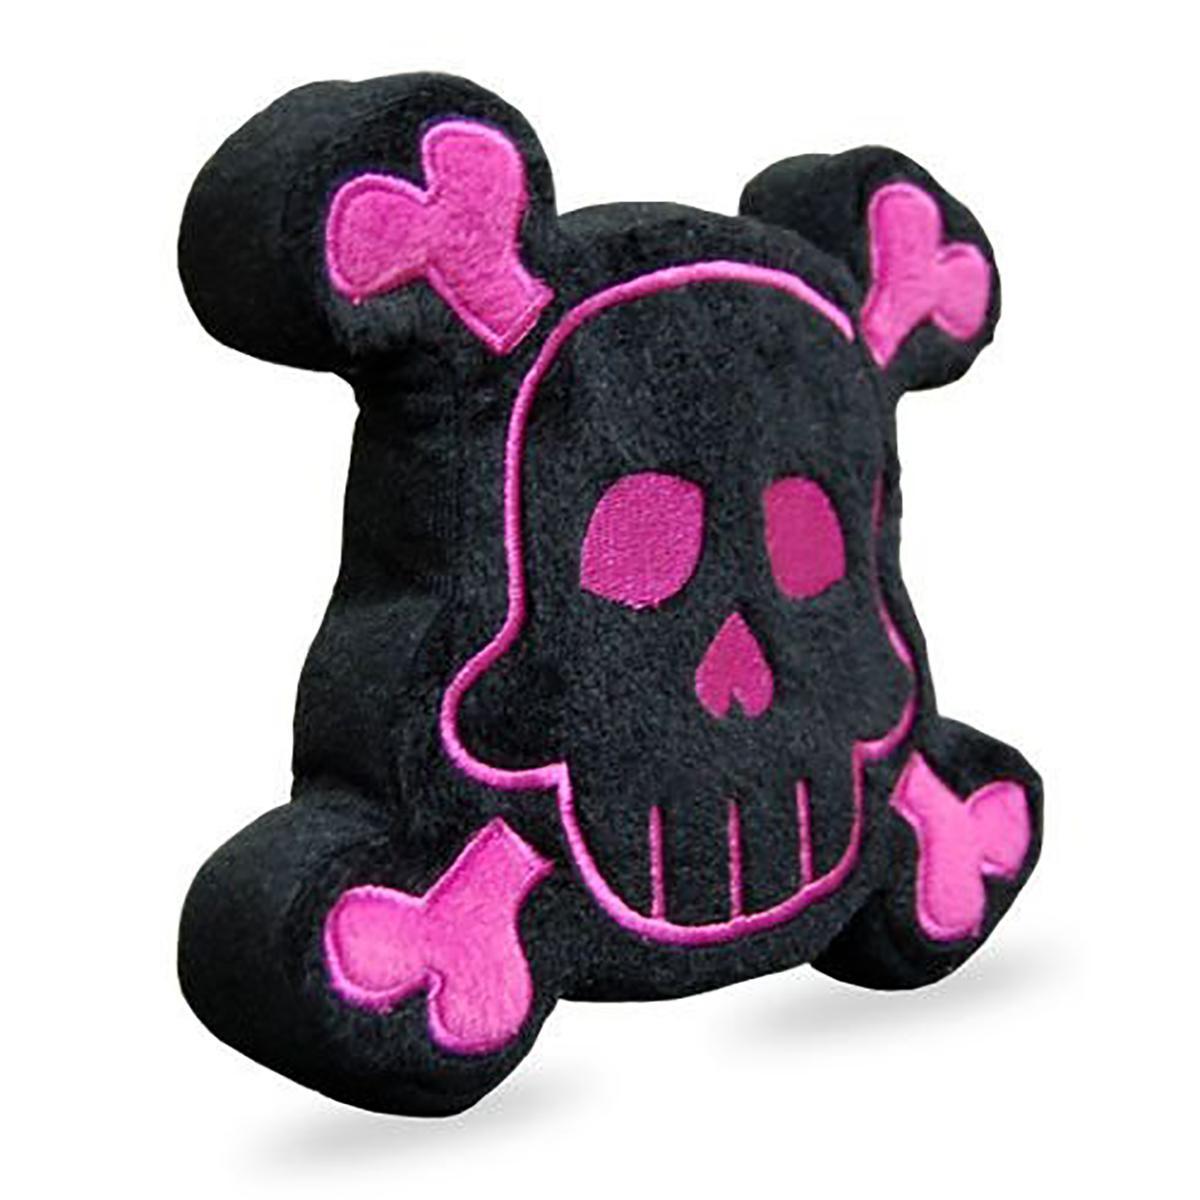 PrideBites Skull & Crossbones Dog Toy